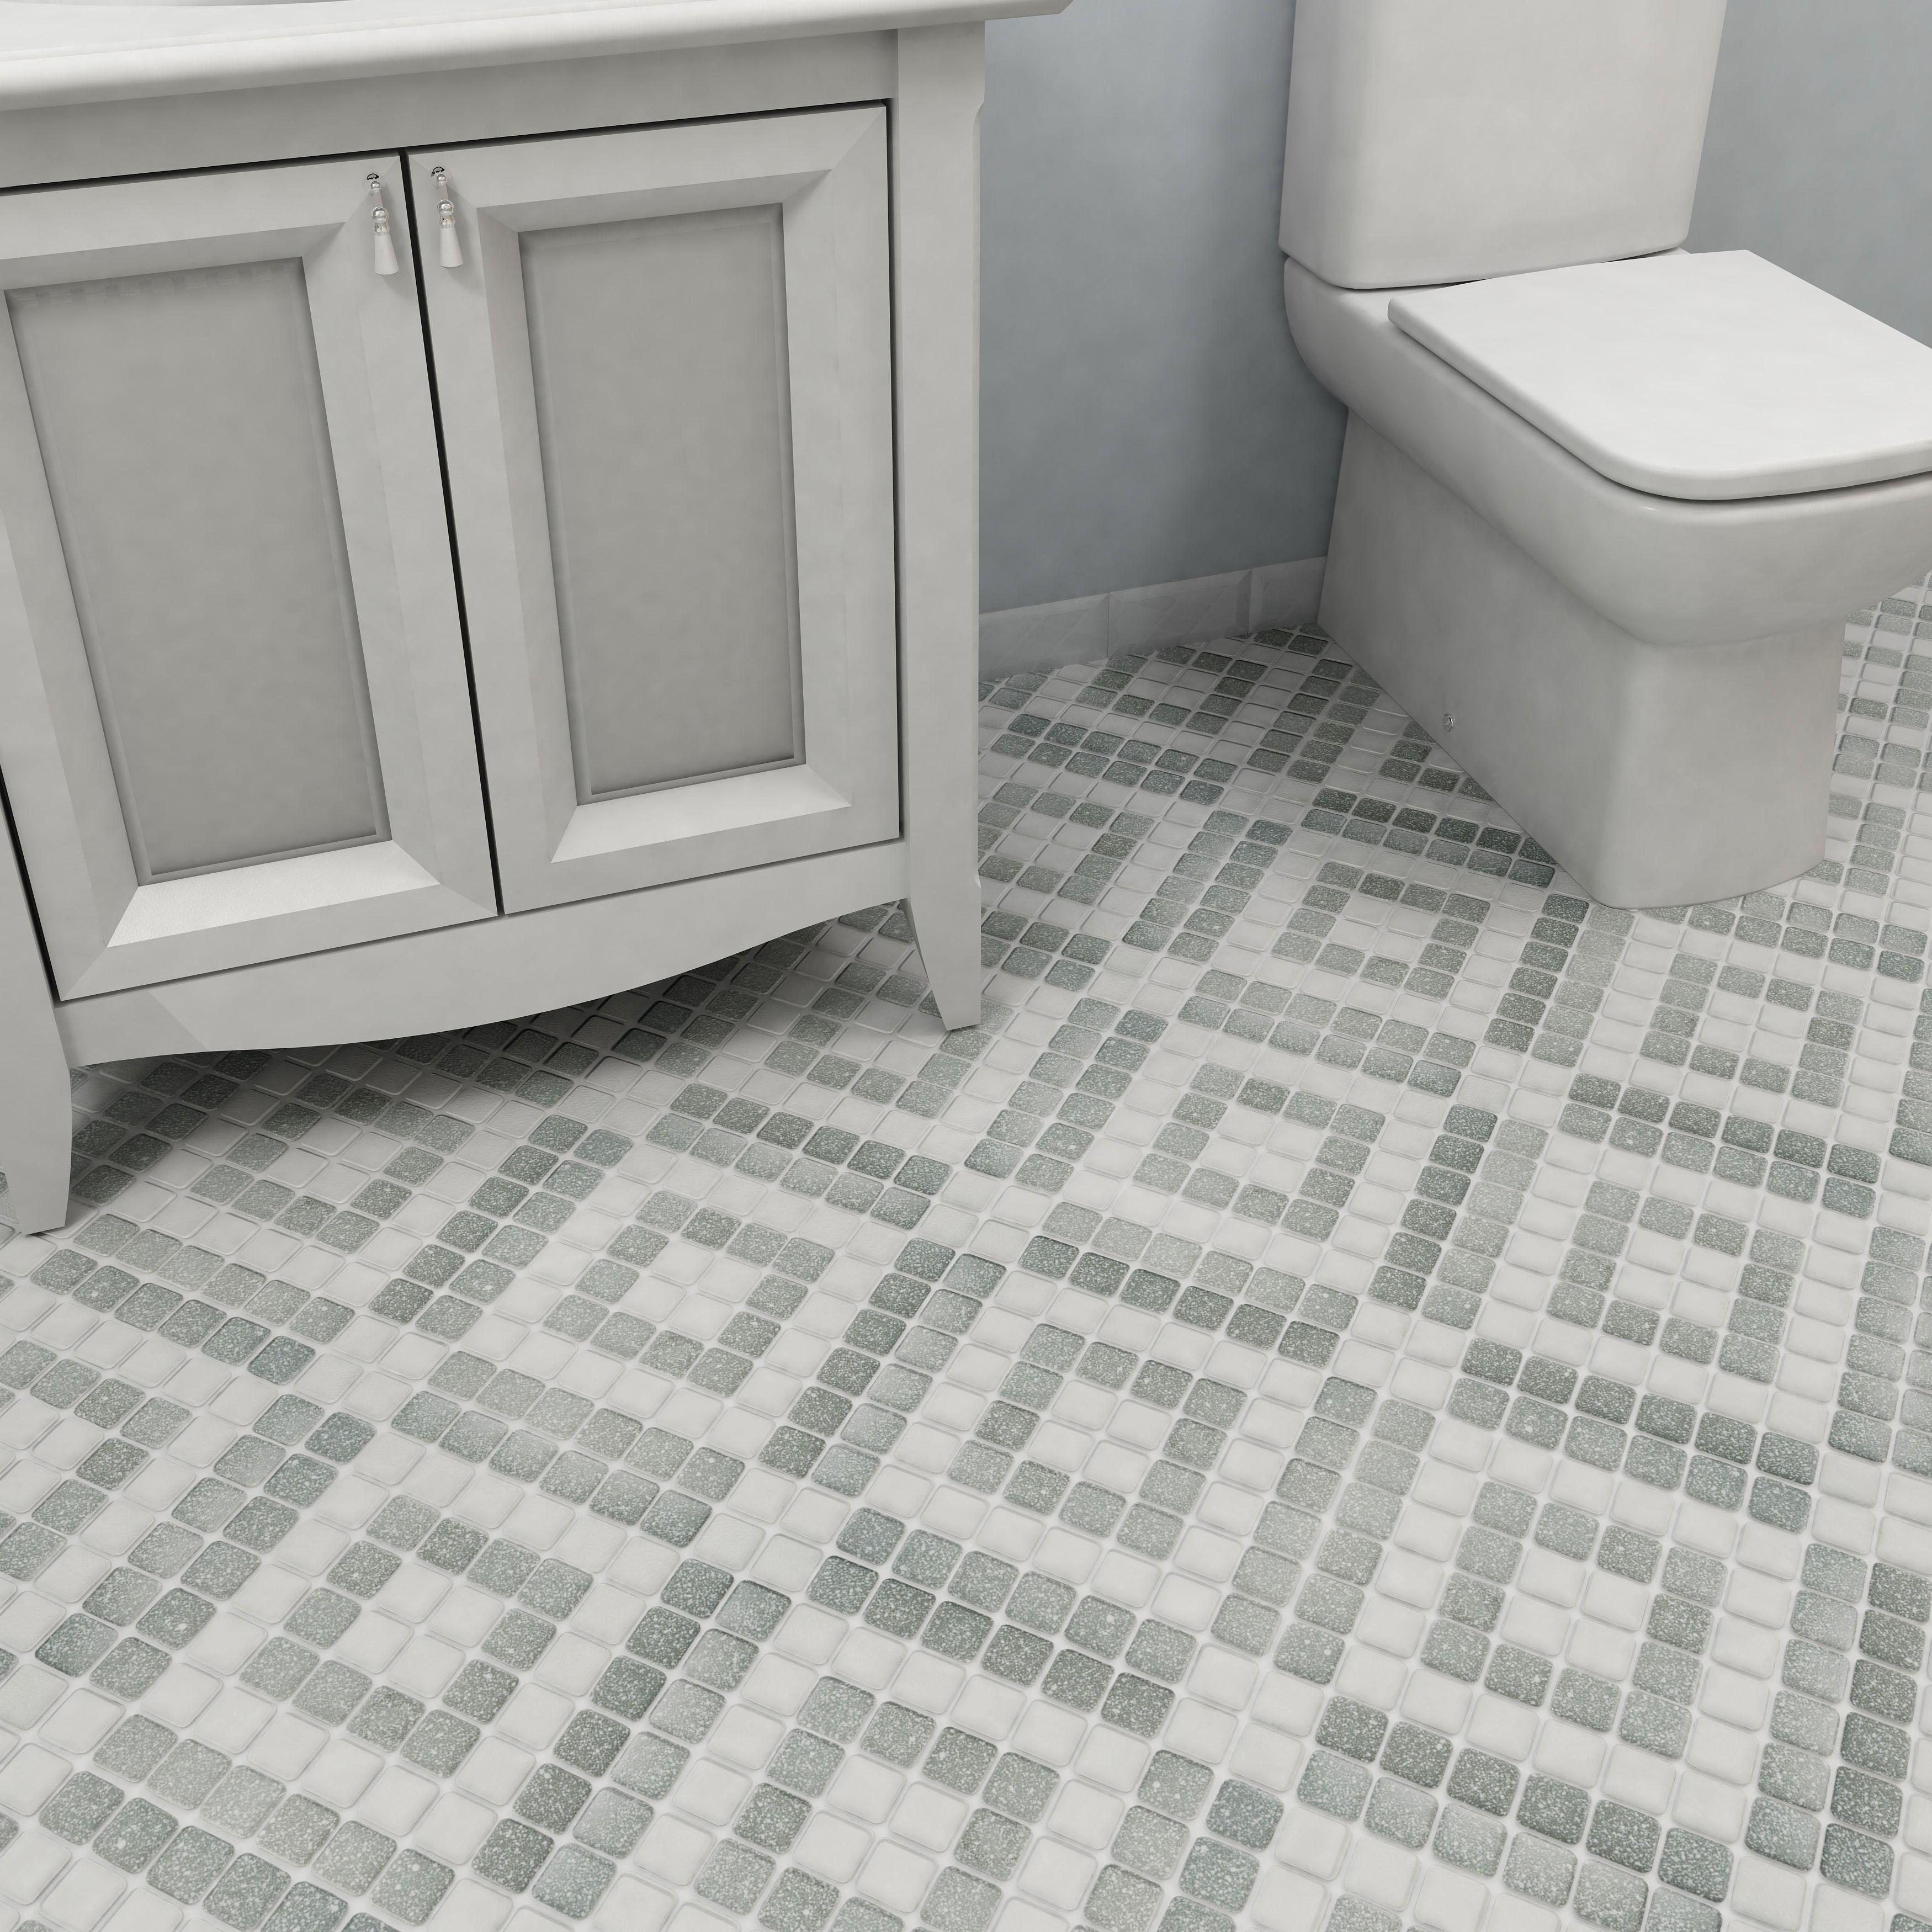 SomerTile 11.75x11.75inch Scholar Bazaar Grey Porcelain